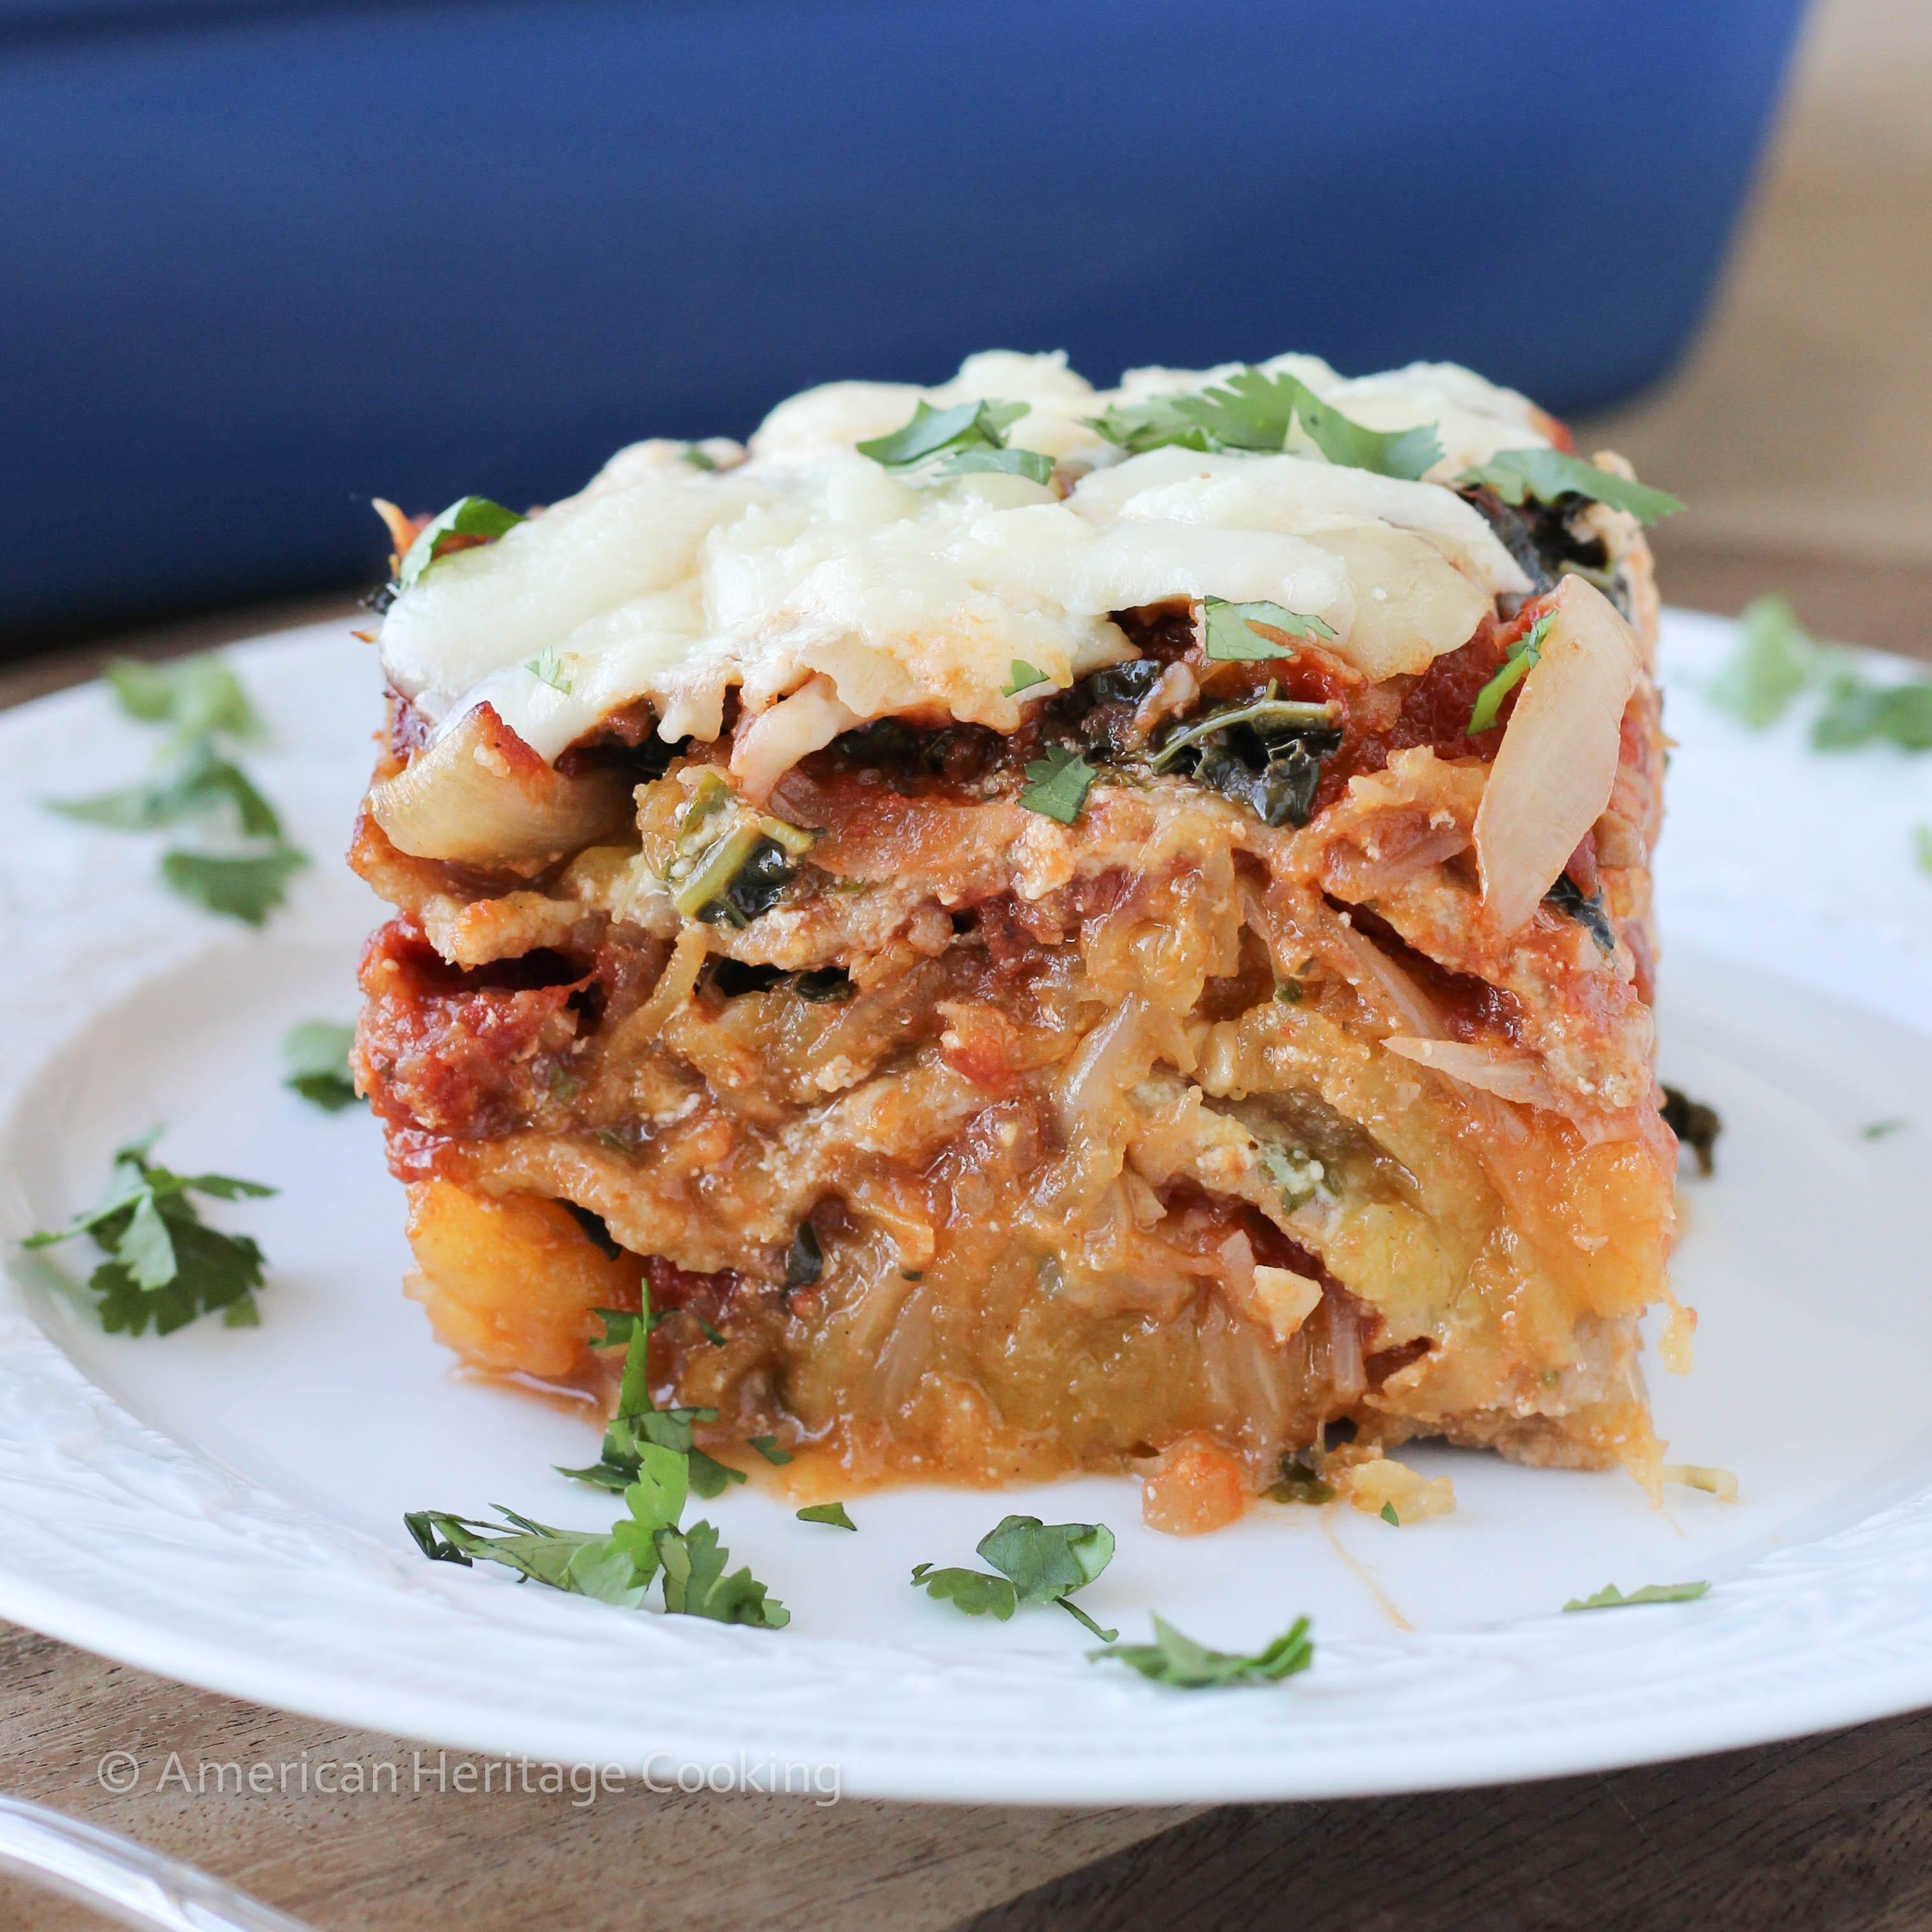 This Spaghetti Squash Kale Lasagna is flavored with bright cilantro ...